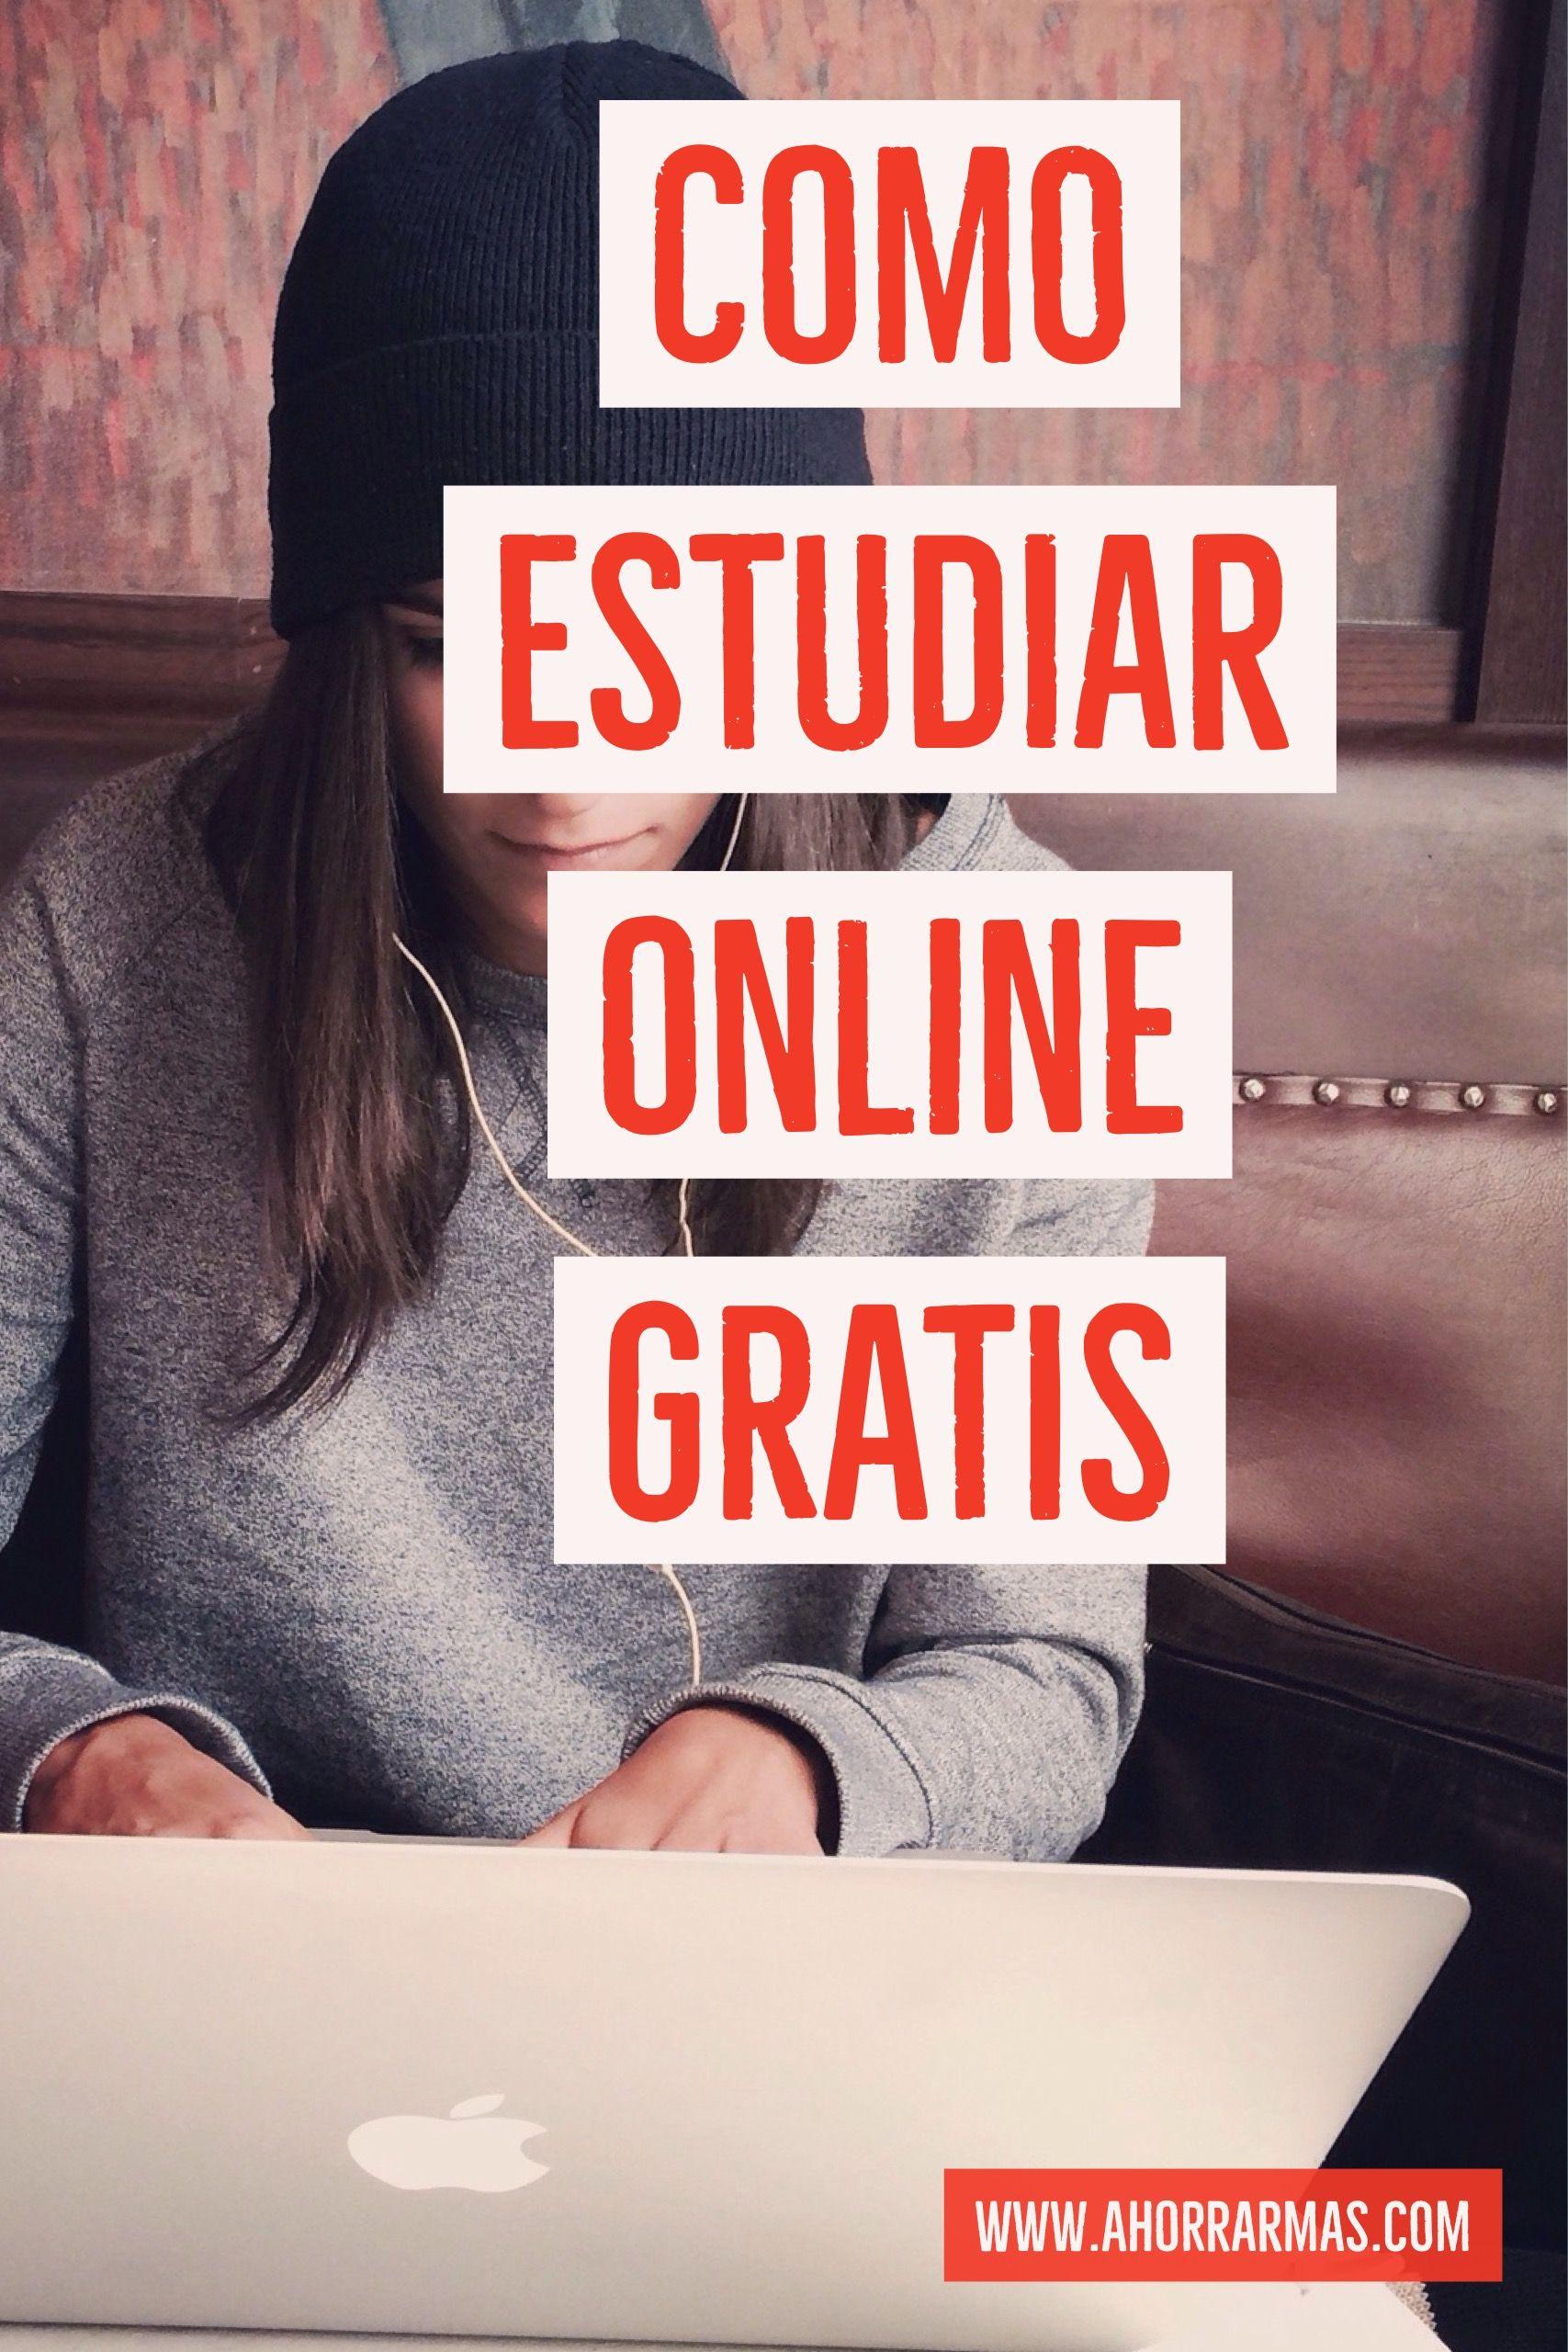 Cursos Gratuitos Online Como Estudiar Online Gratis Ahorrar Mas Como Estudiar Consejos Para Estudiar Cursos Gratuitos Online